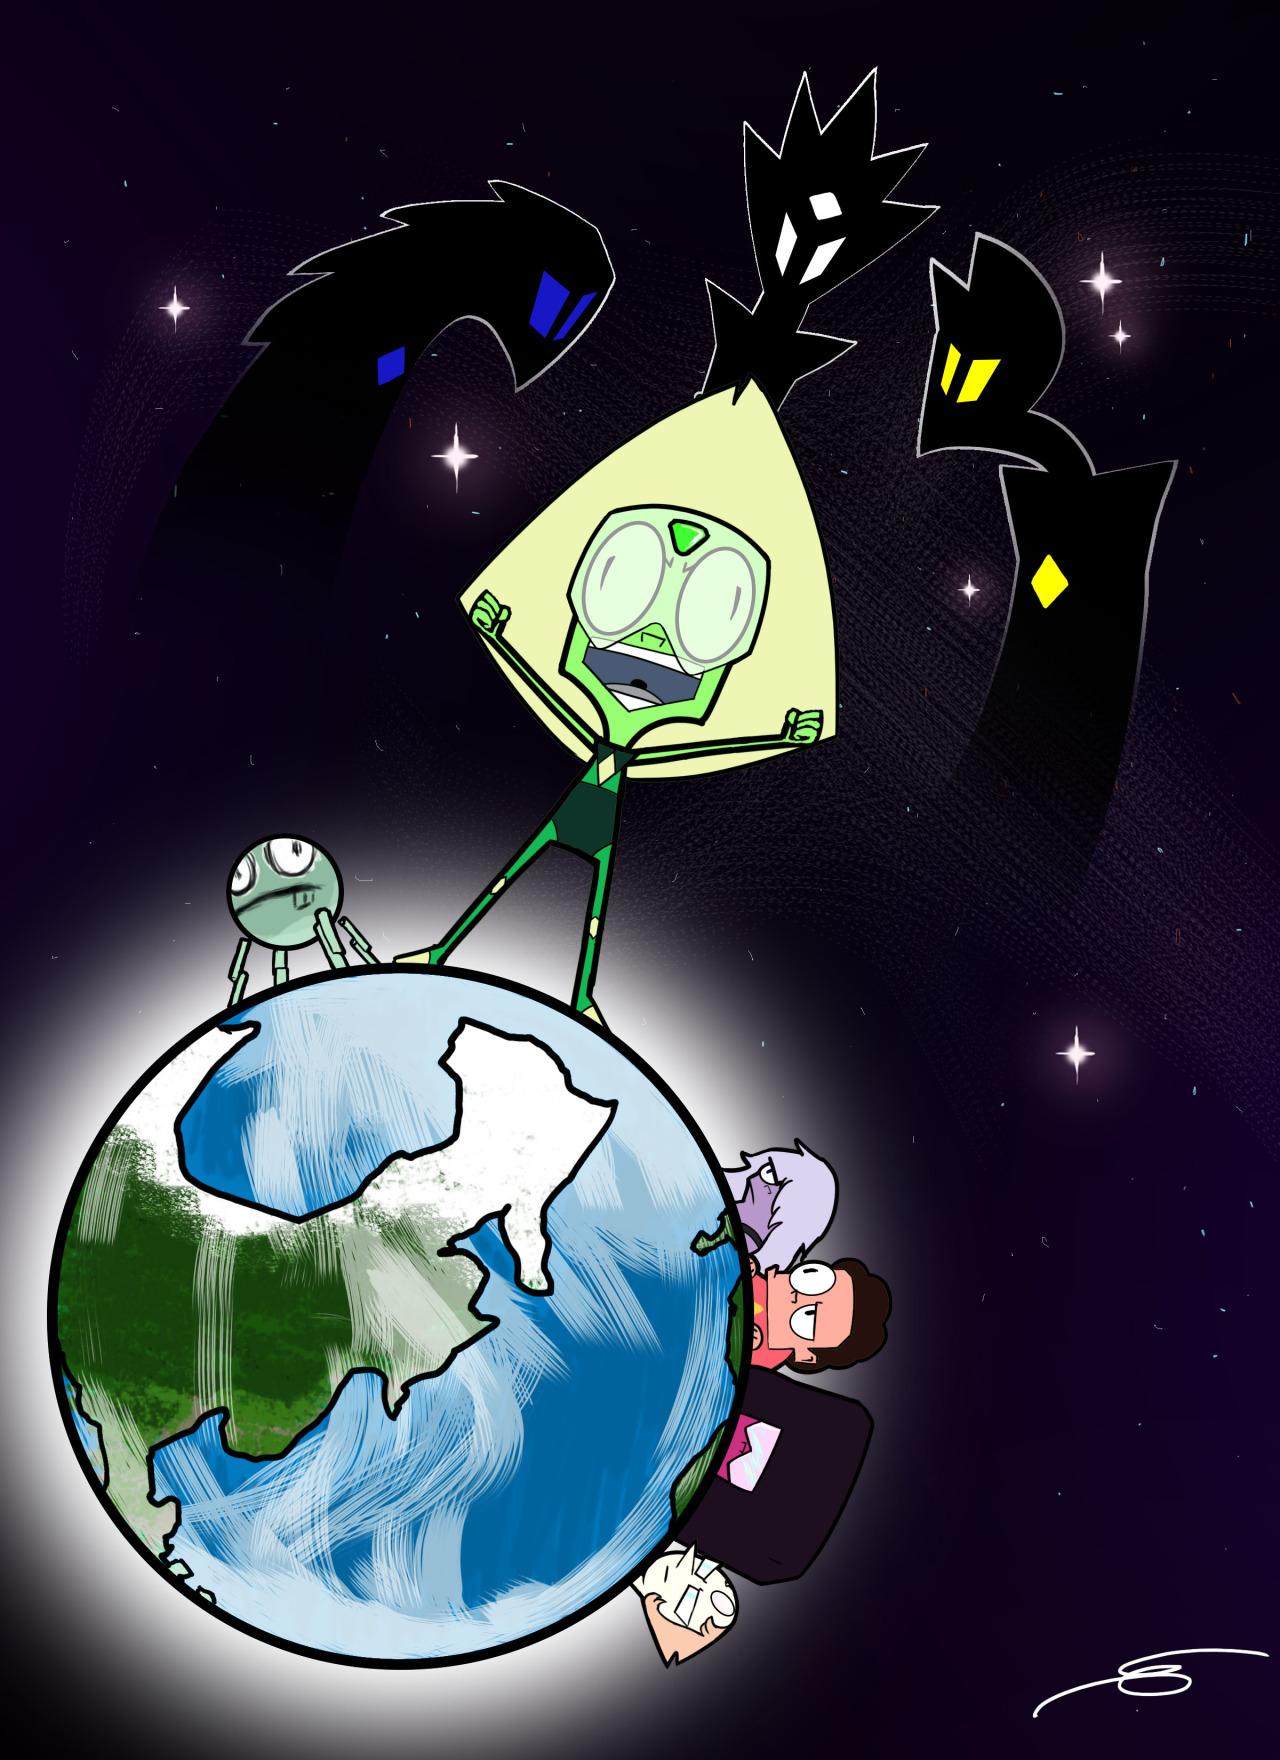 Invader Peri Steven Universe Know Your Meme